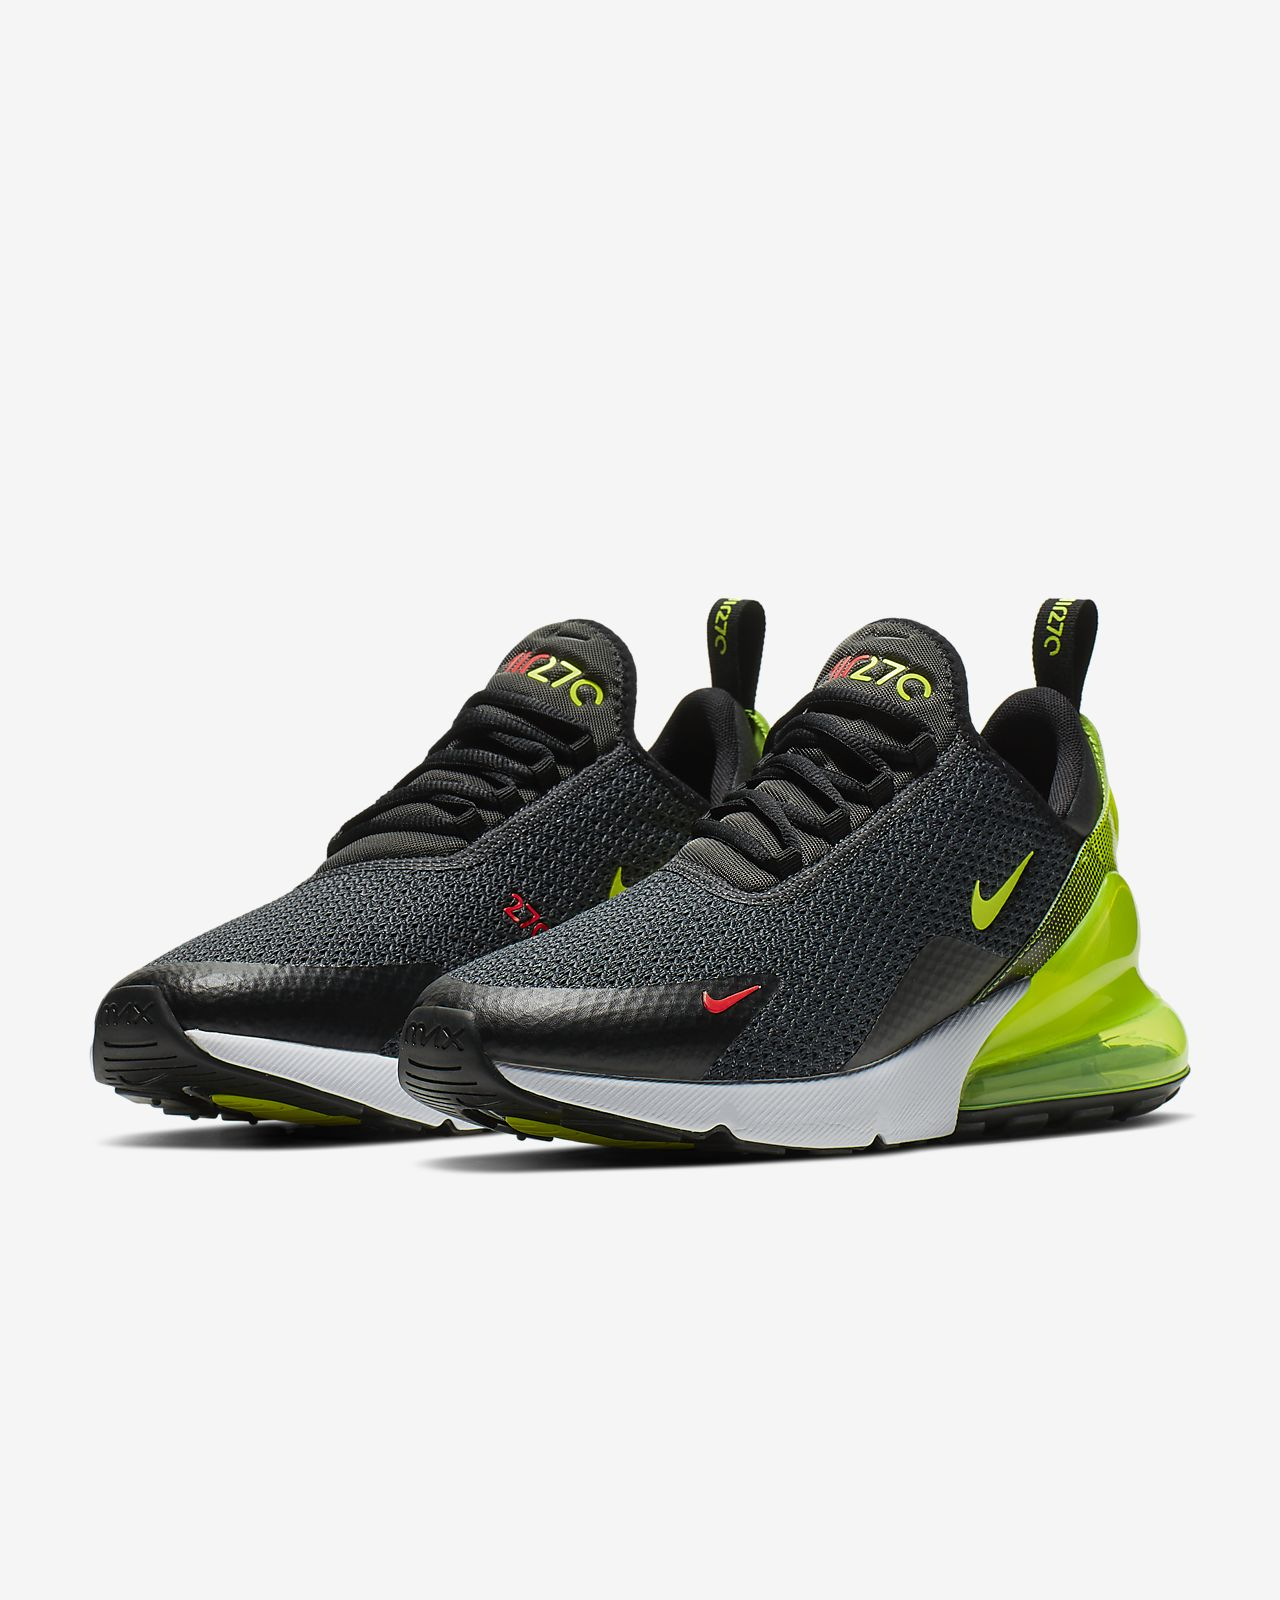 nike uomo scarpe 2019 air max 270